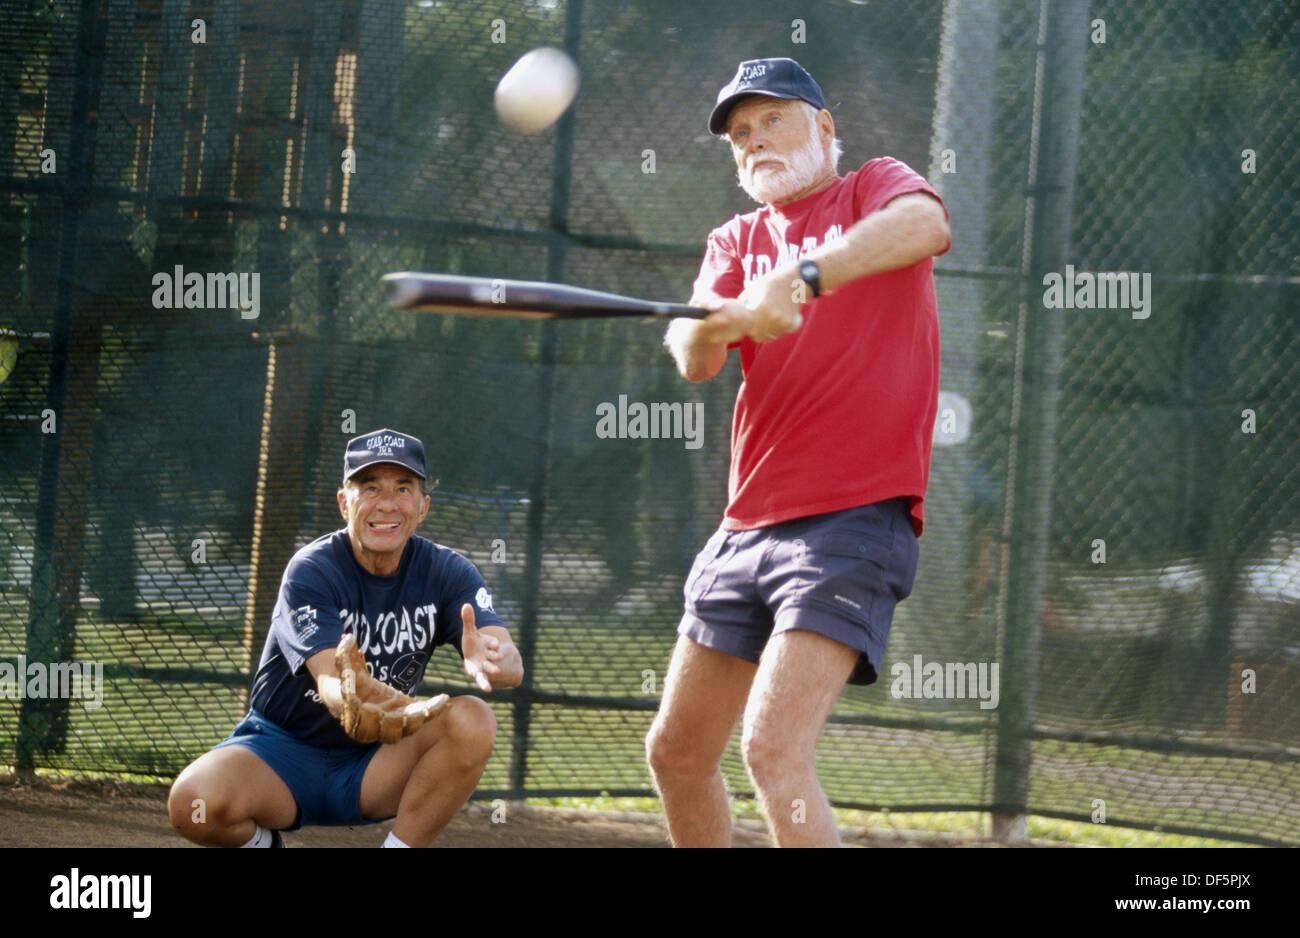 Senior Softball Stock Photos & Senior Softball Stock Images - Alamy